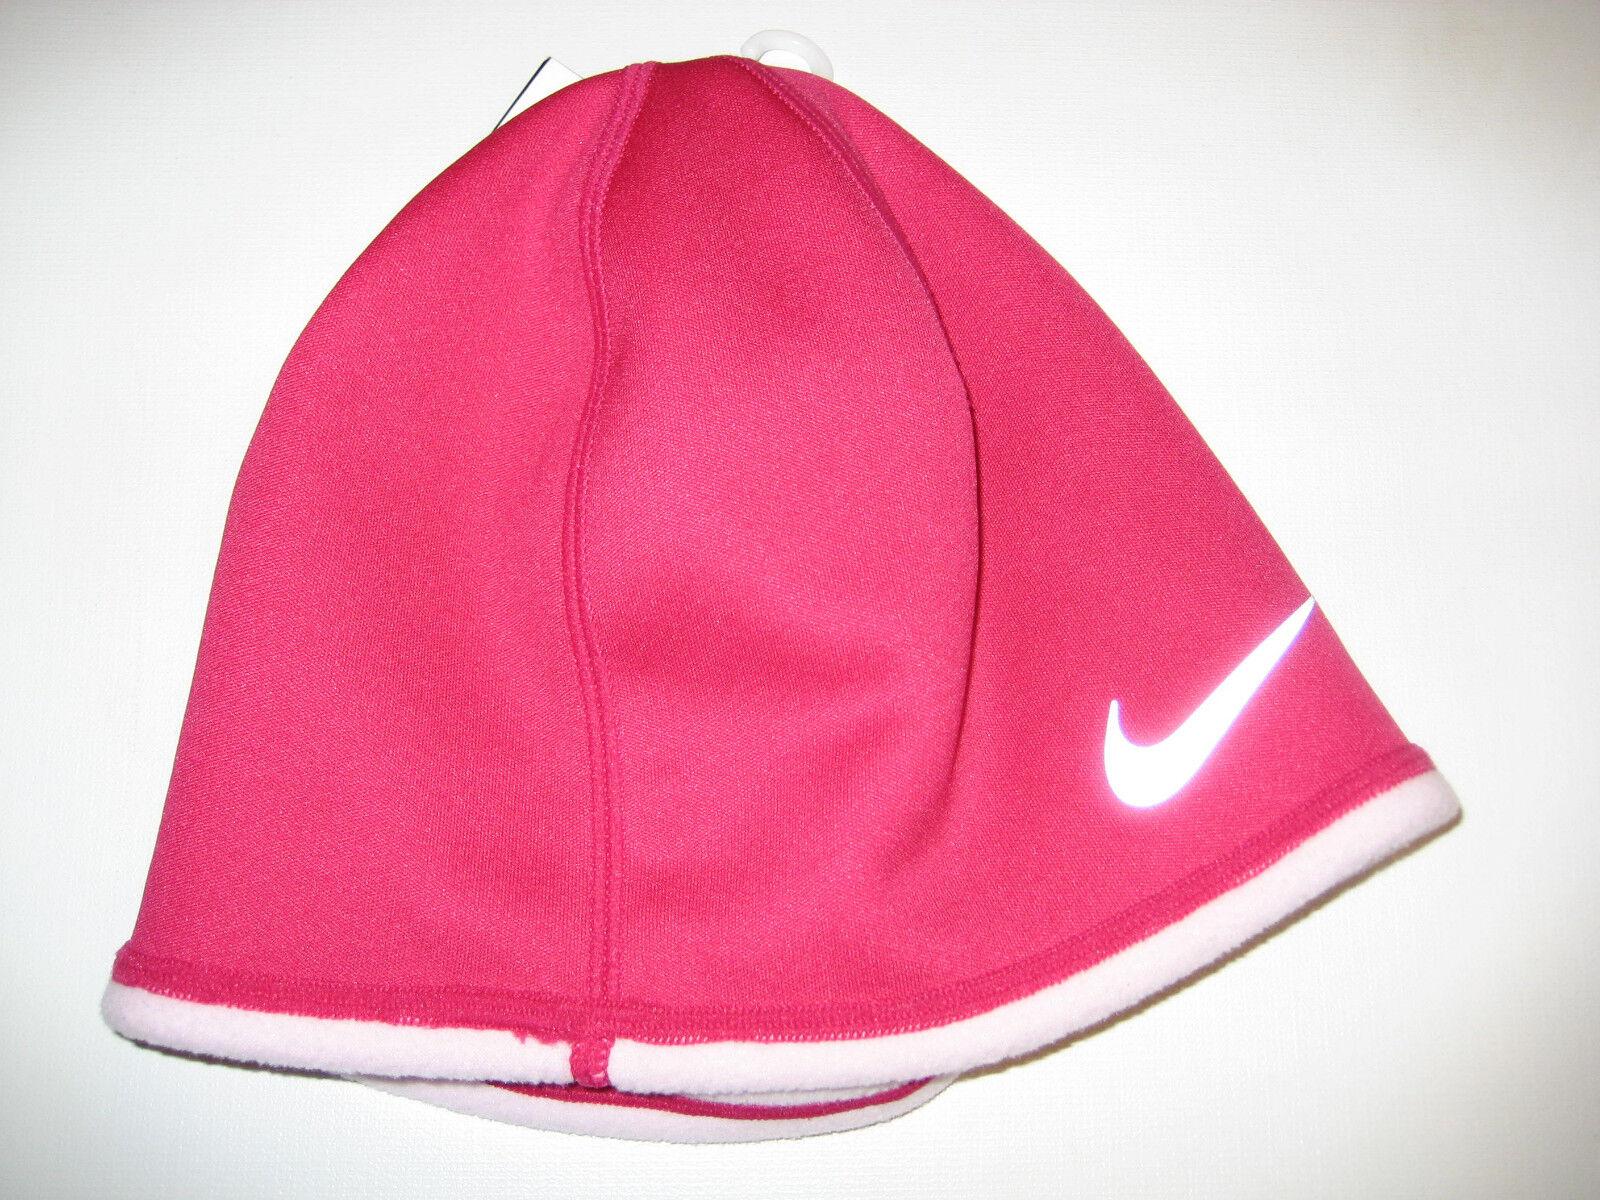 98ce88cf4 Girls Nike Therma-fit Fleece Beanie Hat Pink Reversible Snow Skiing Running  OSFM